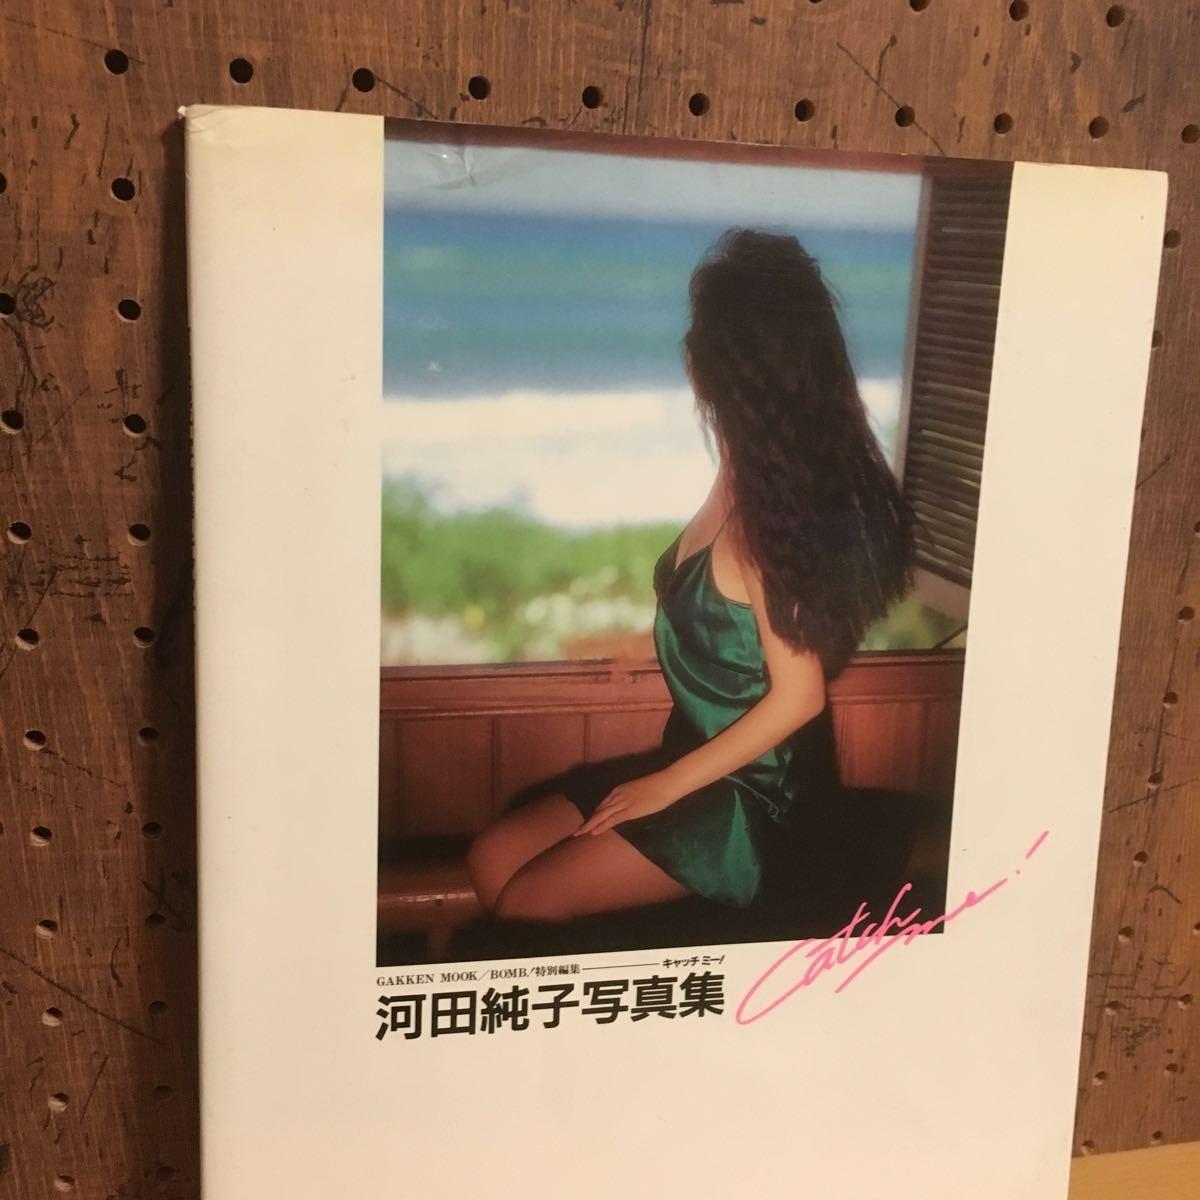 河田純子 写真集 キャッチミー! 初版_画像2